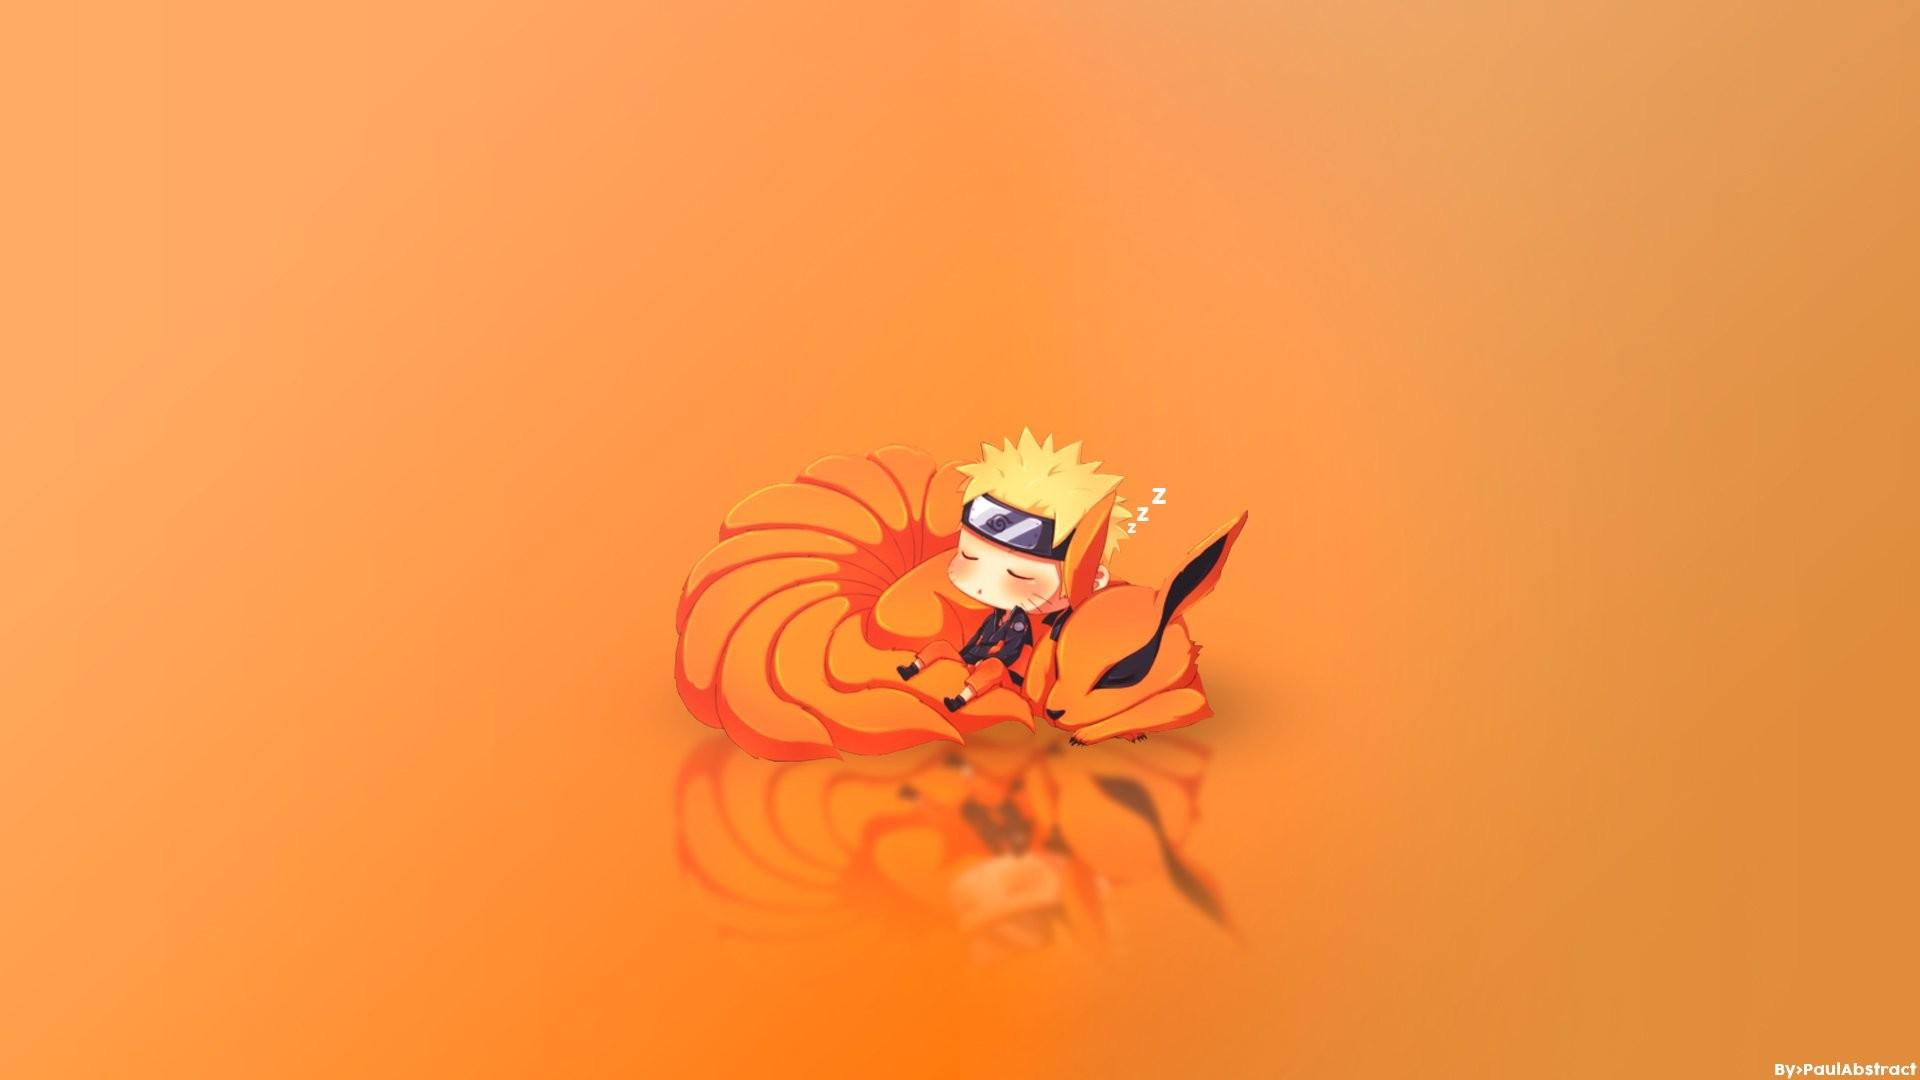 Naruto and Kurama Wallpapers (73+ images)